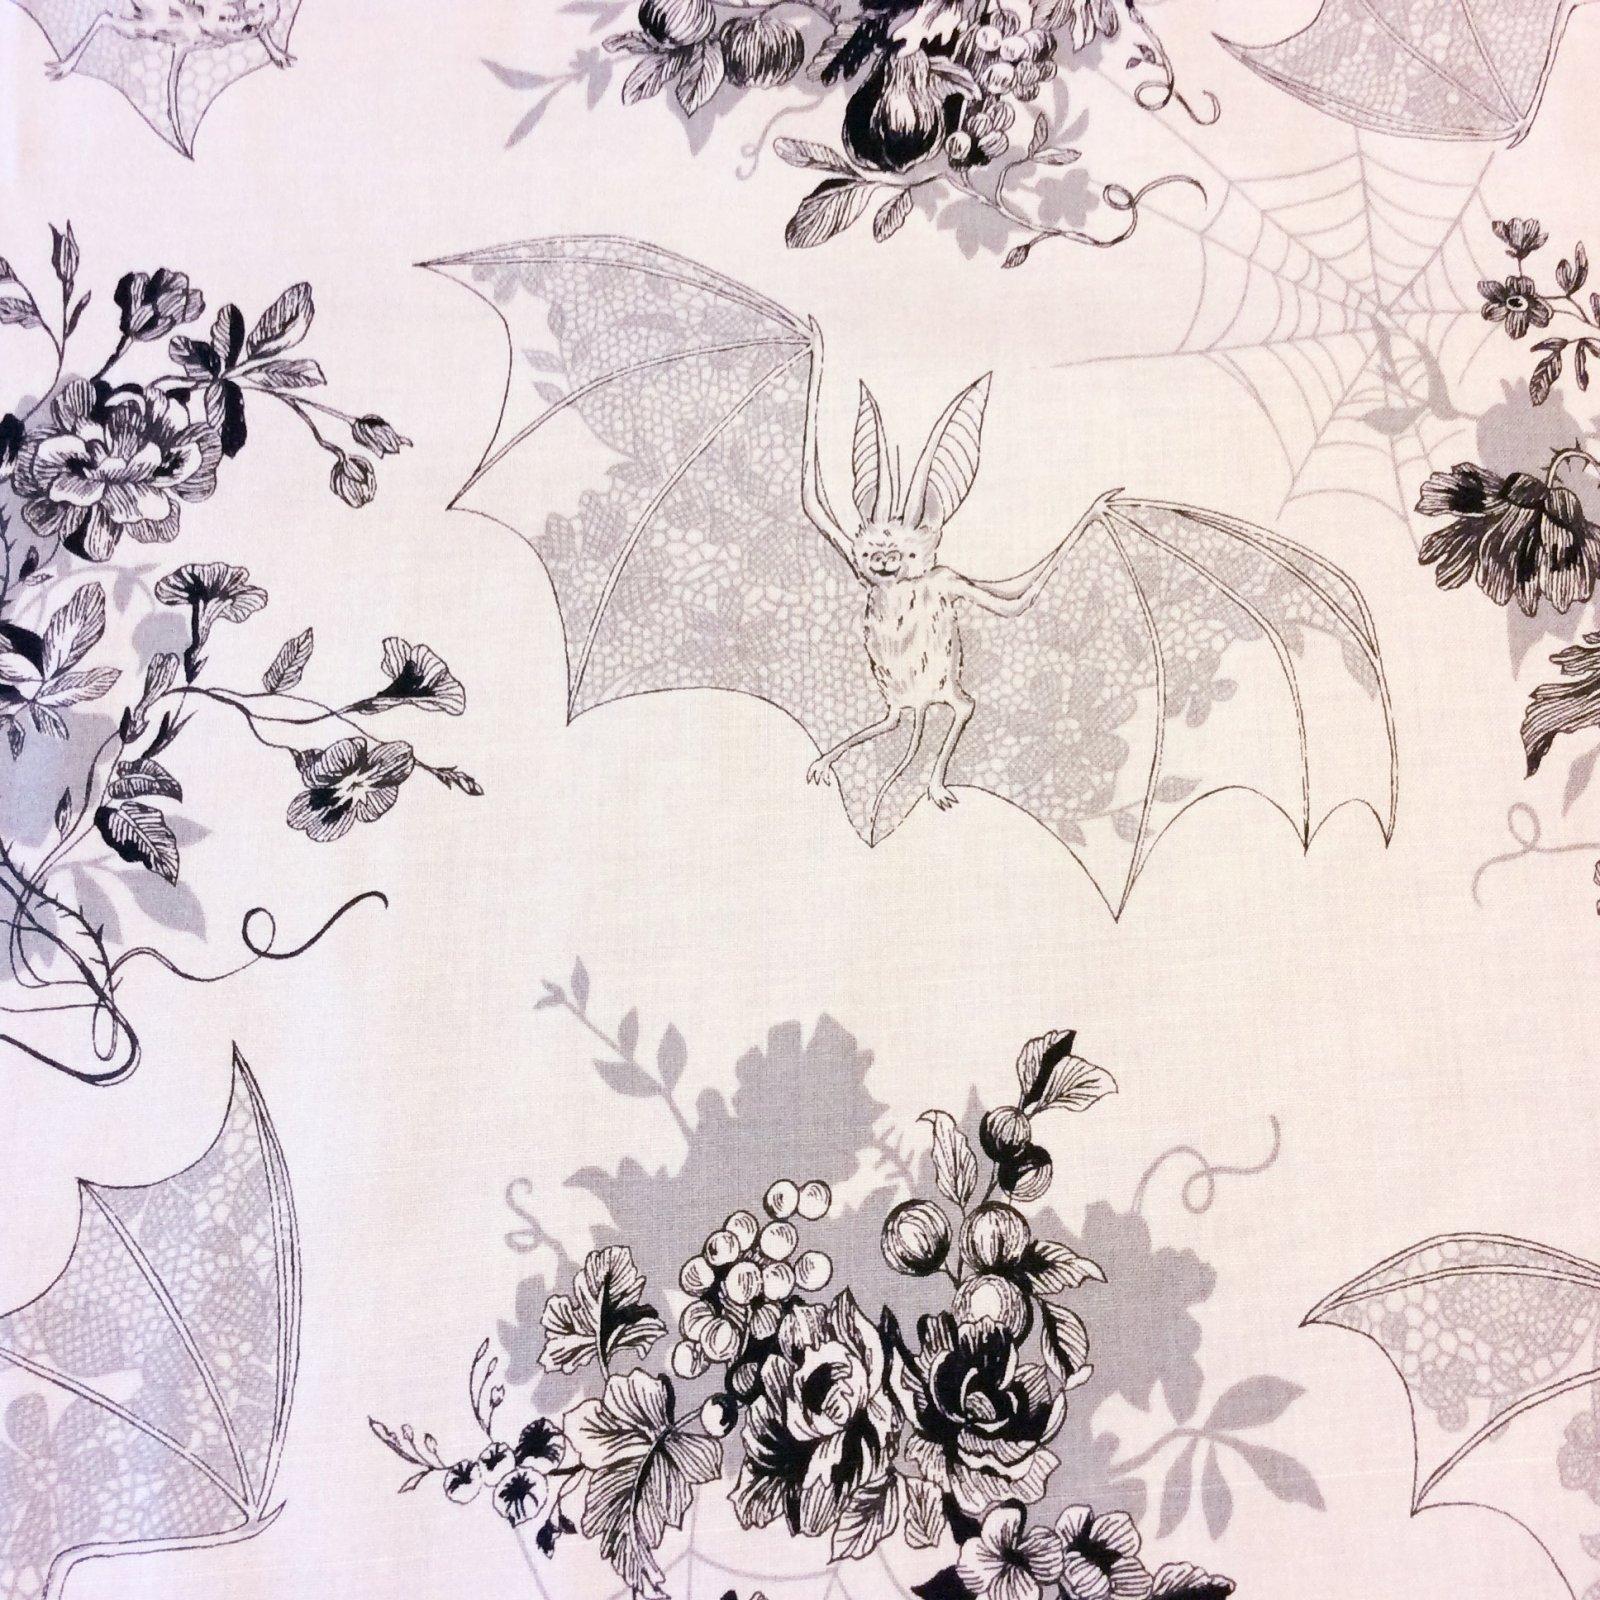 Bats Alexander Henry Halloween Bat Web Floral Holiday Goth Night Vampire Cotton Quilt Fabric AH203